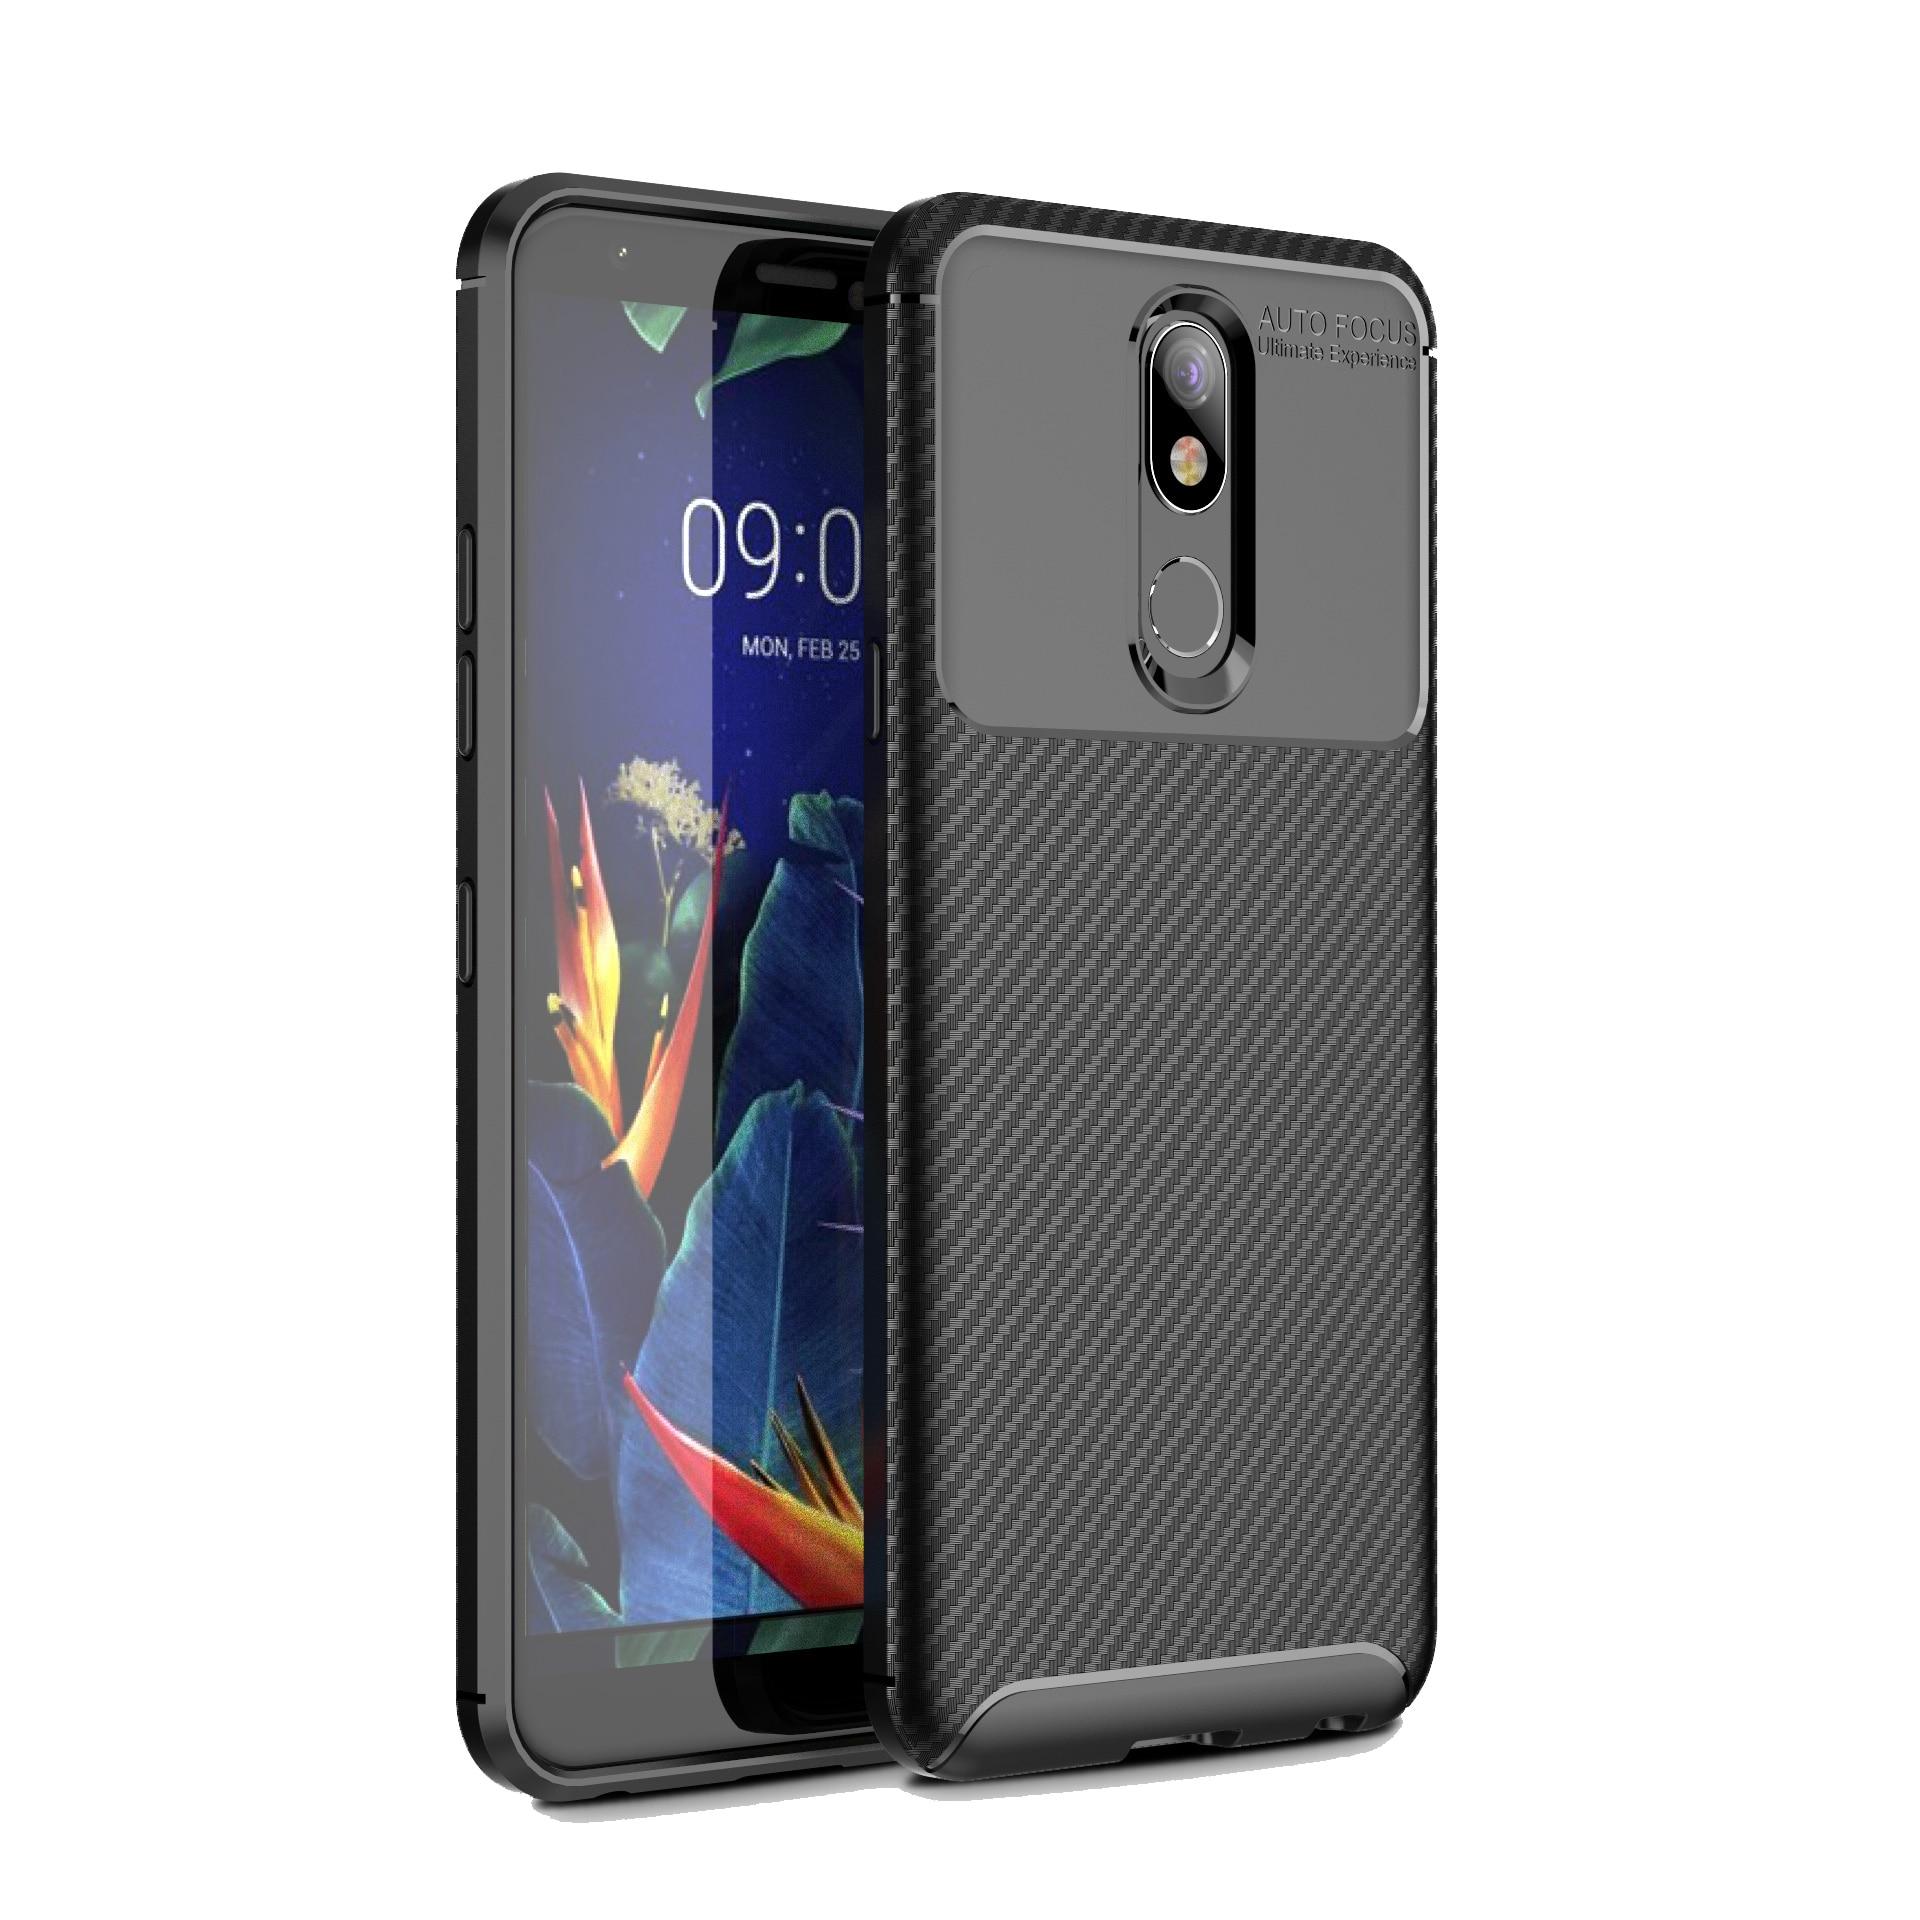 De moda a prueba de golpes a prueba de negocios de silicona suave TPU armadura protectora cubierta para LG K40 LGK40 DE CASO caso de teléfono de Coque casos